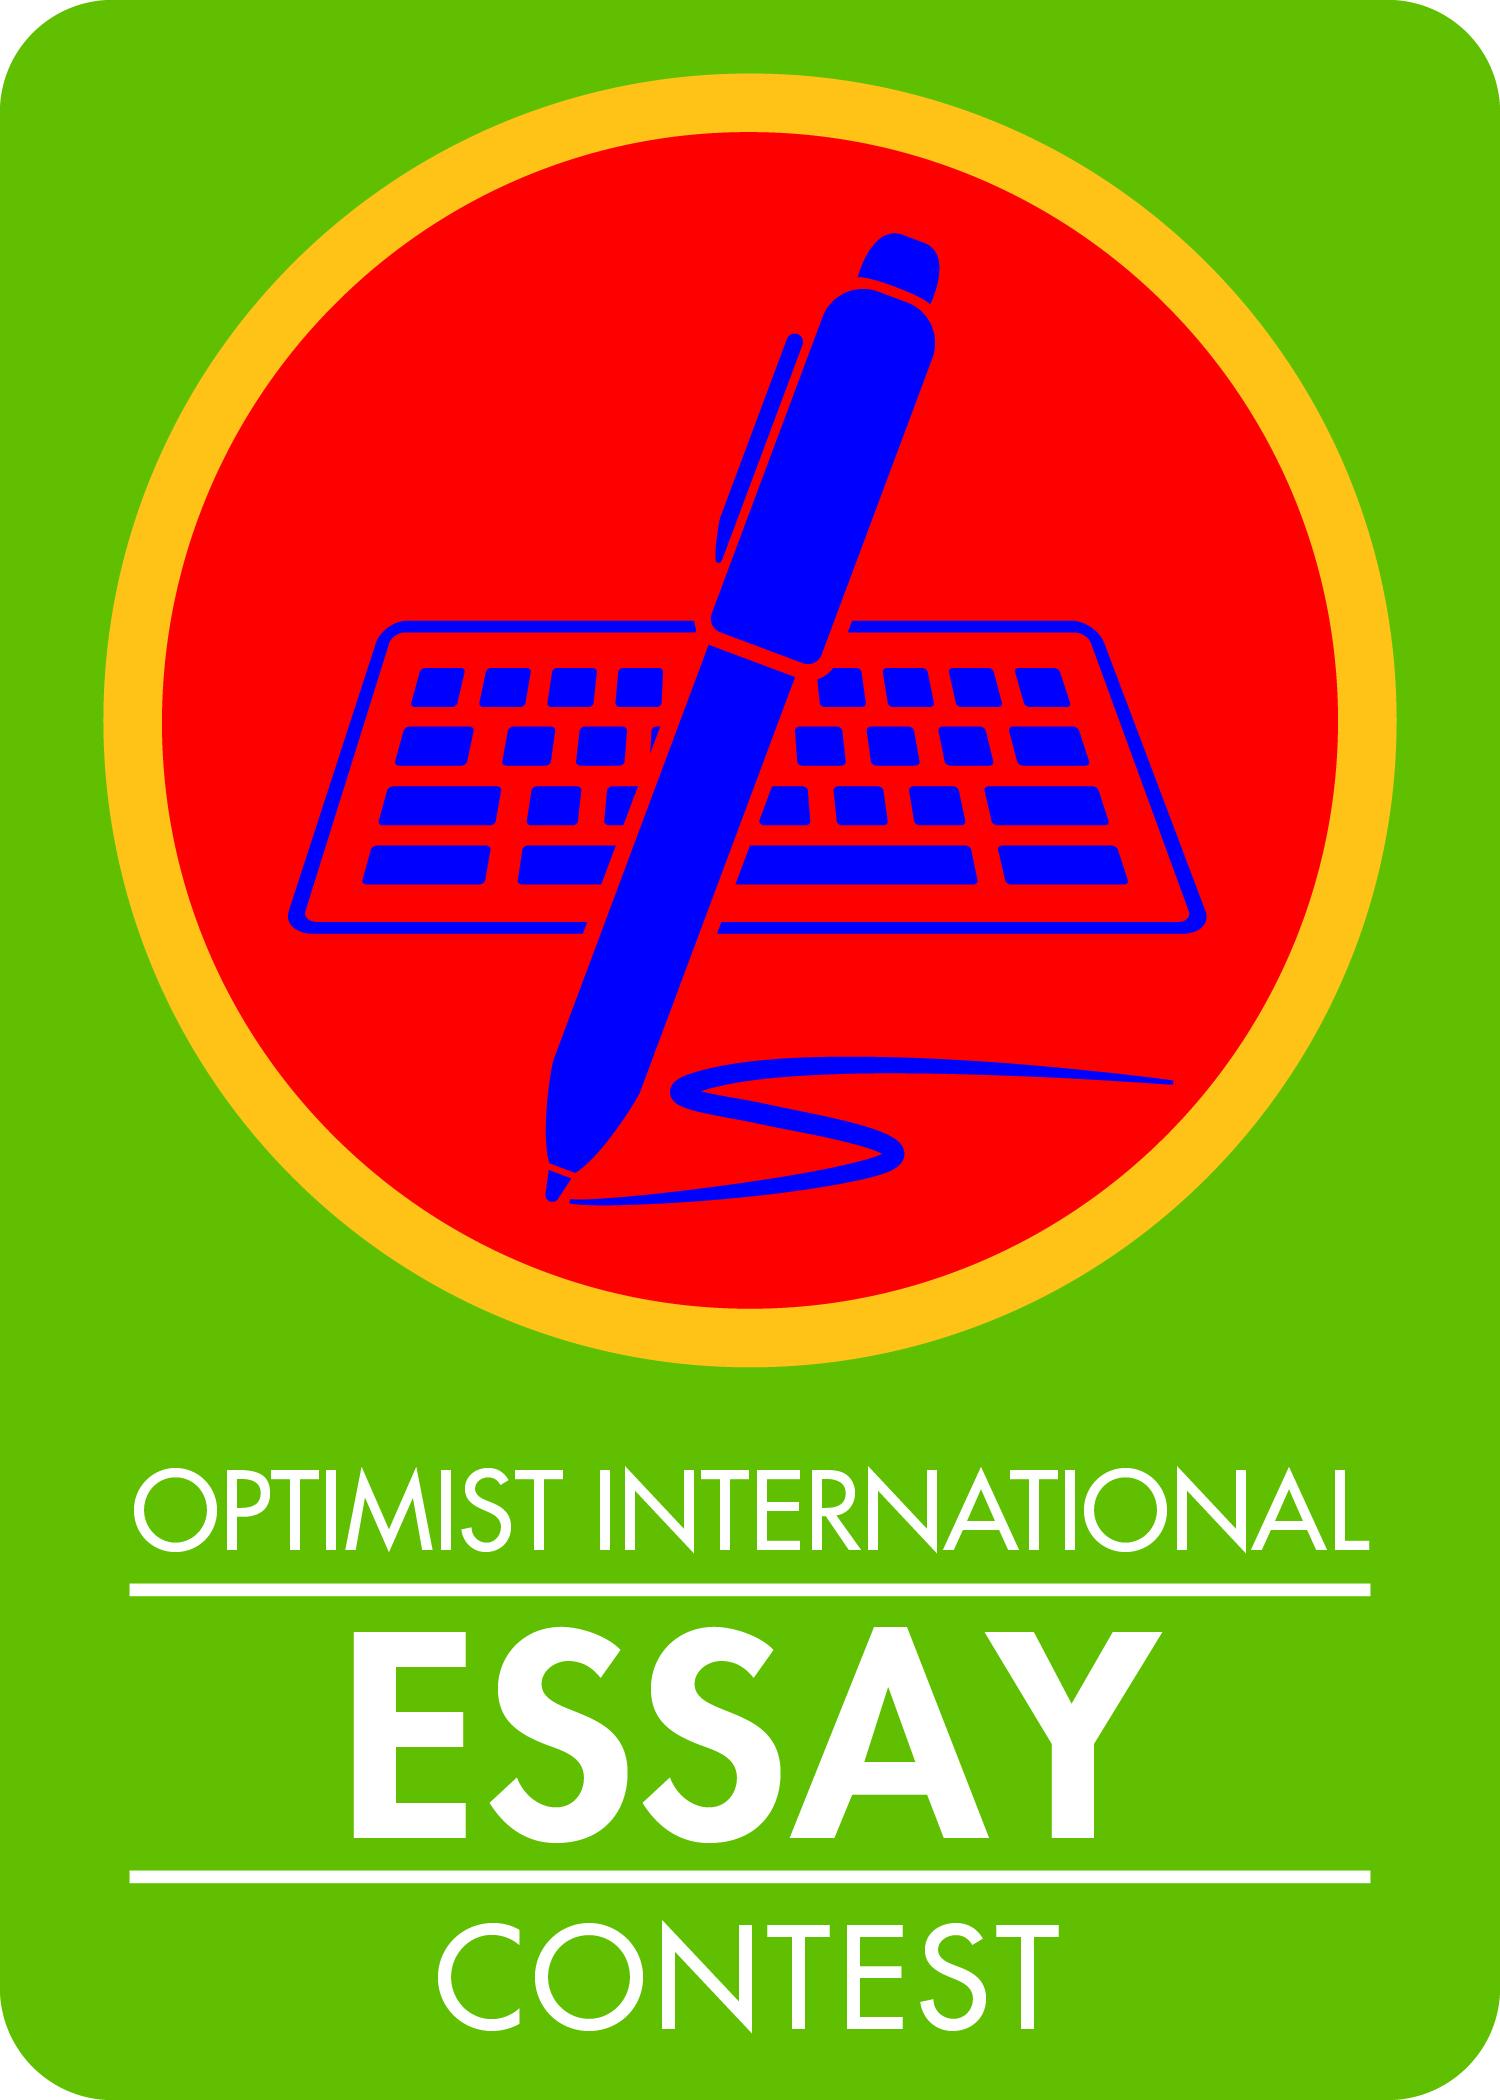 001 Essay Example High Res Optimist International Wondrous Contest Winners Due Date Oratorical Full